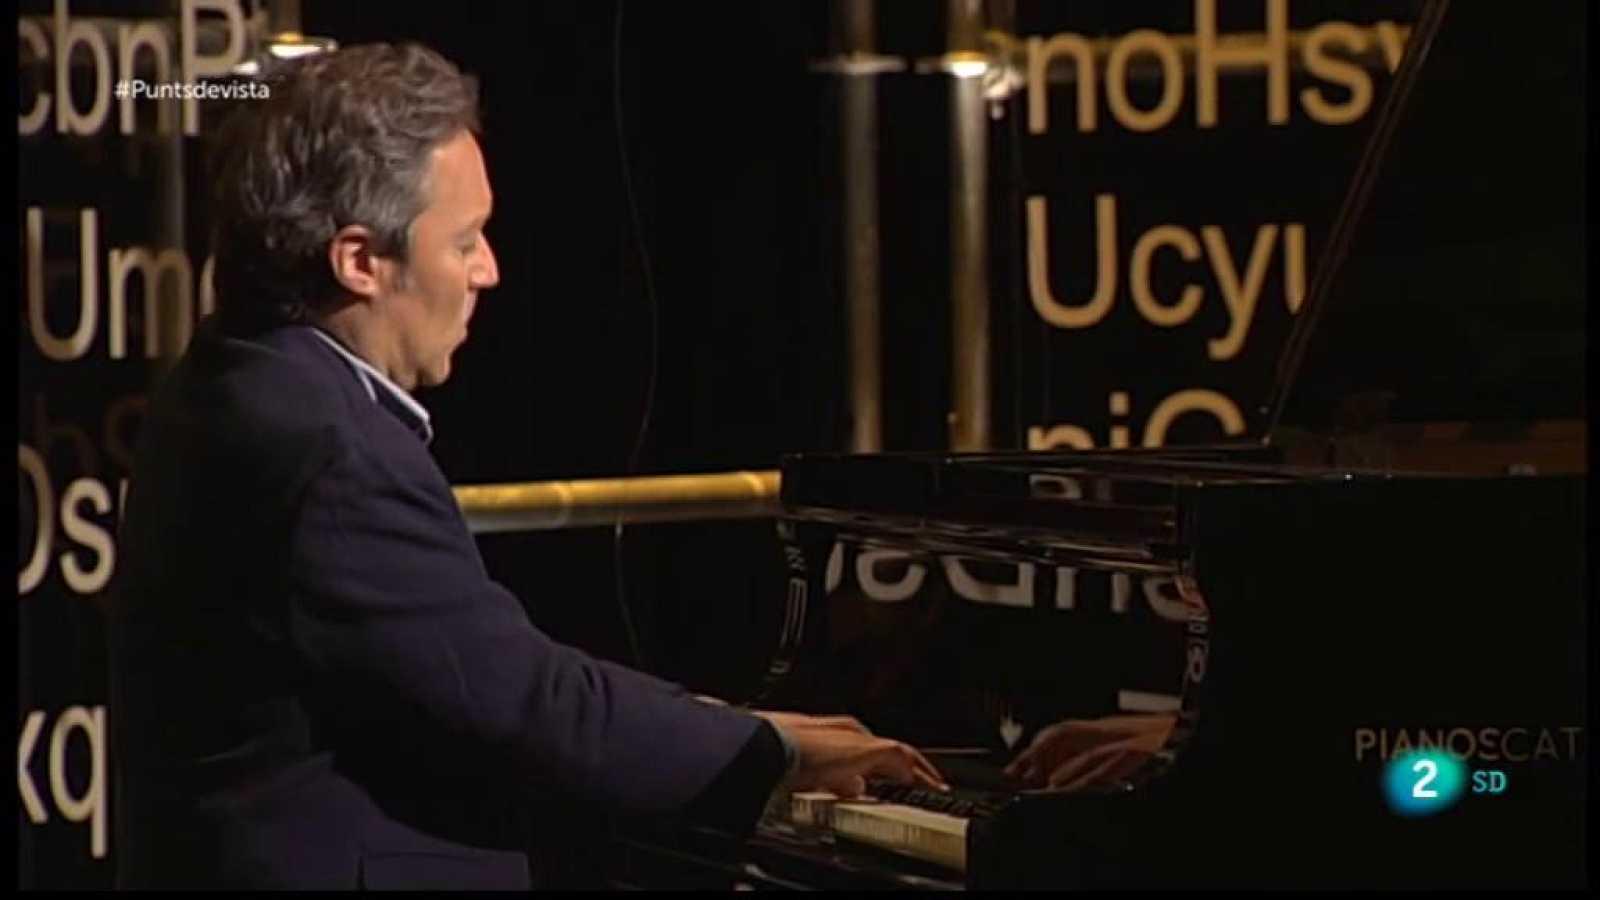 Pianista Daniel Ligorio a Punts de vista